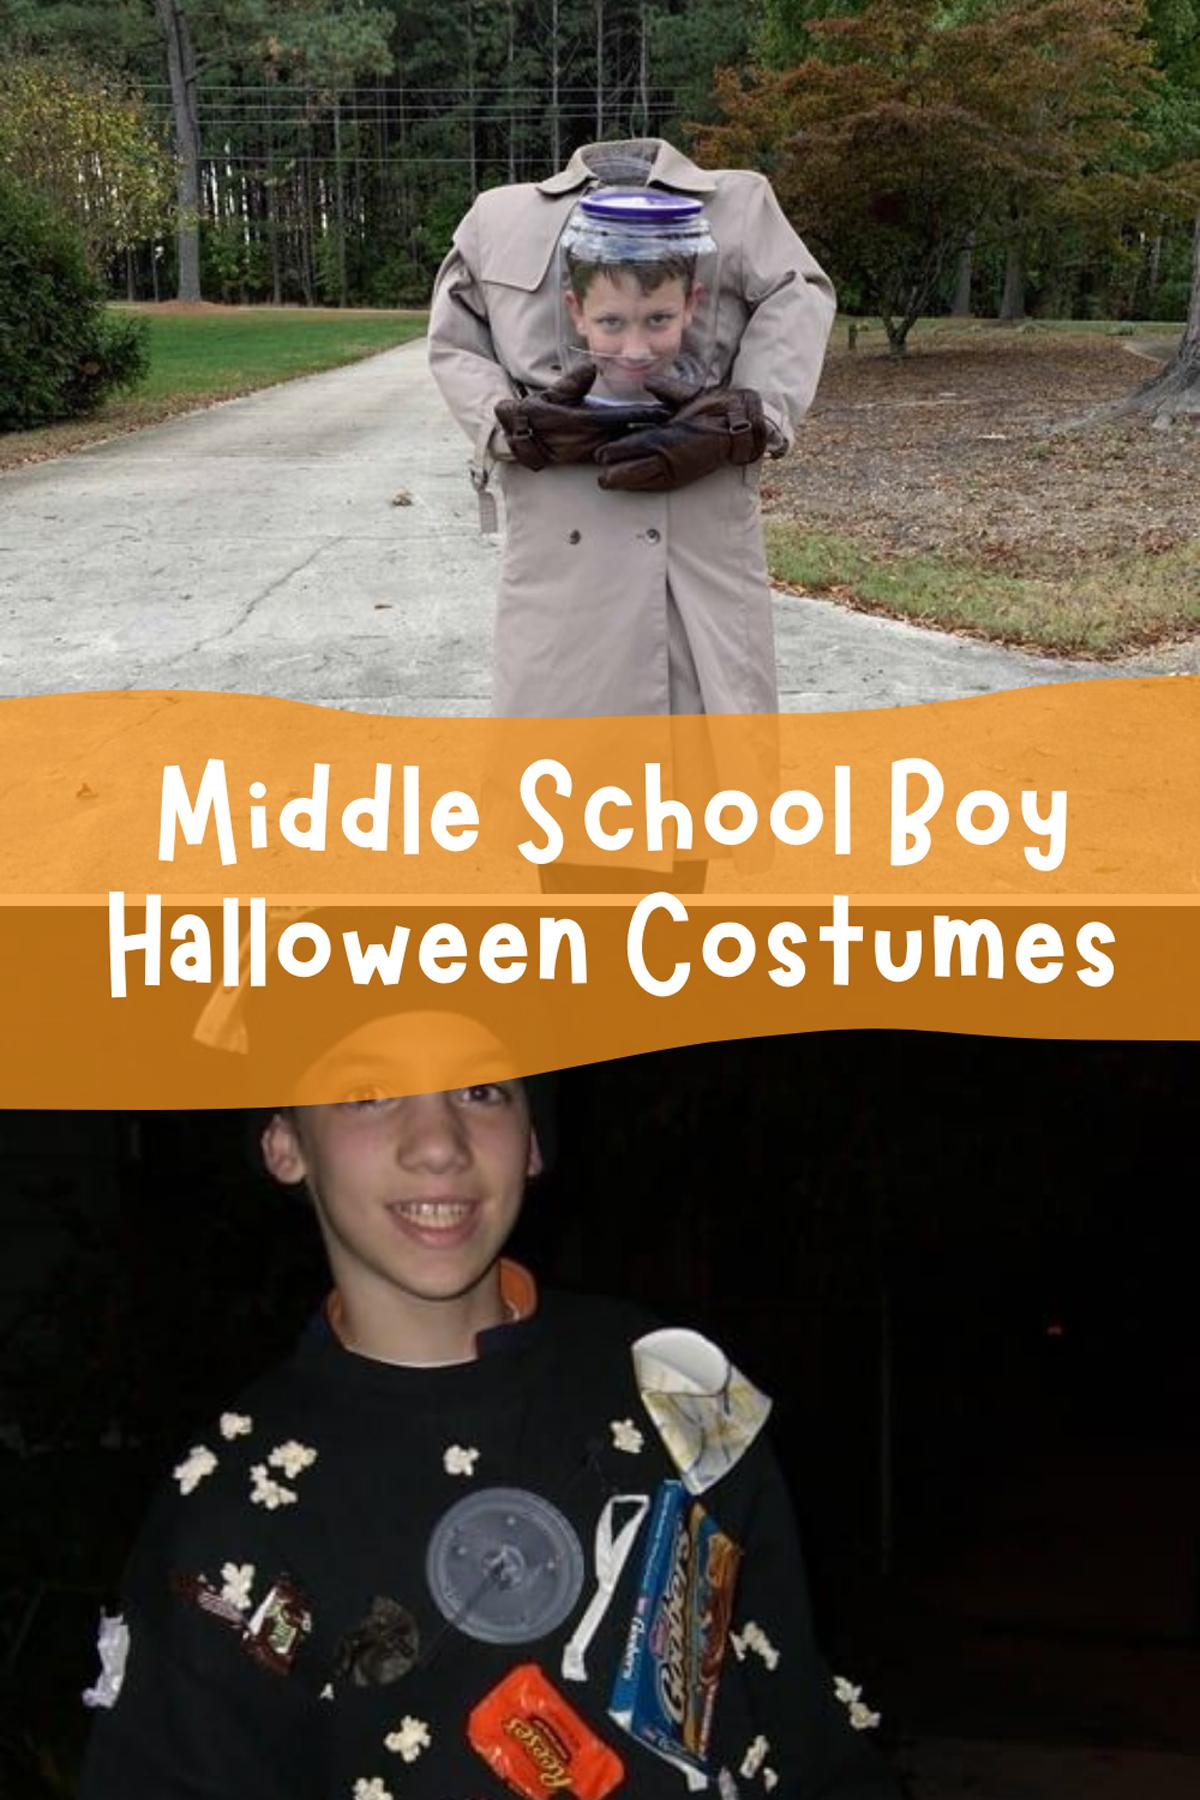 Middle School Boy Halloween Costumes